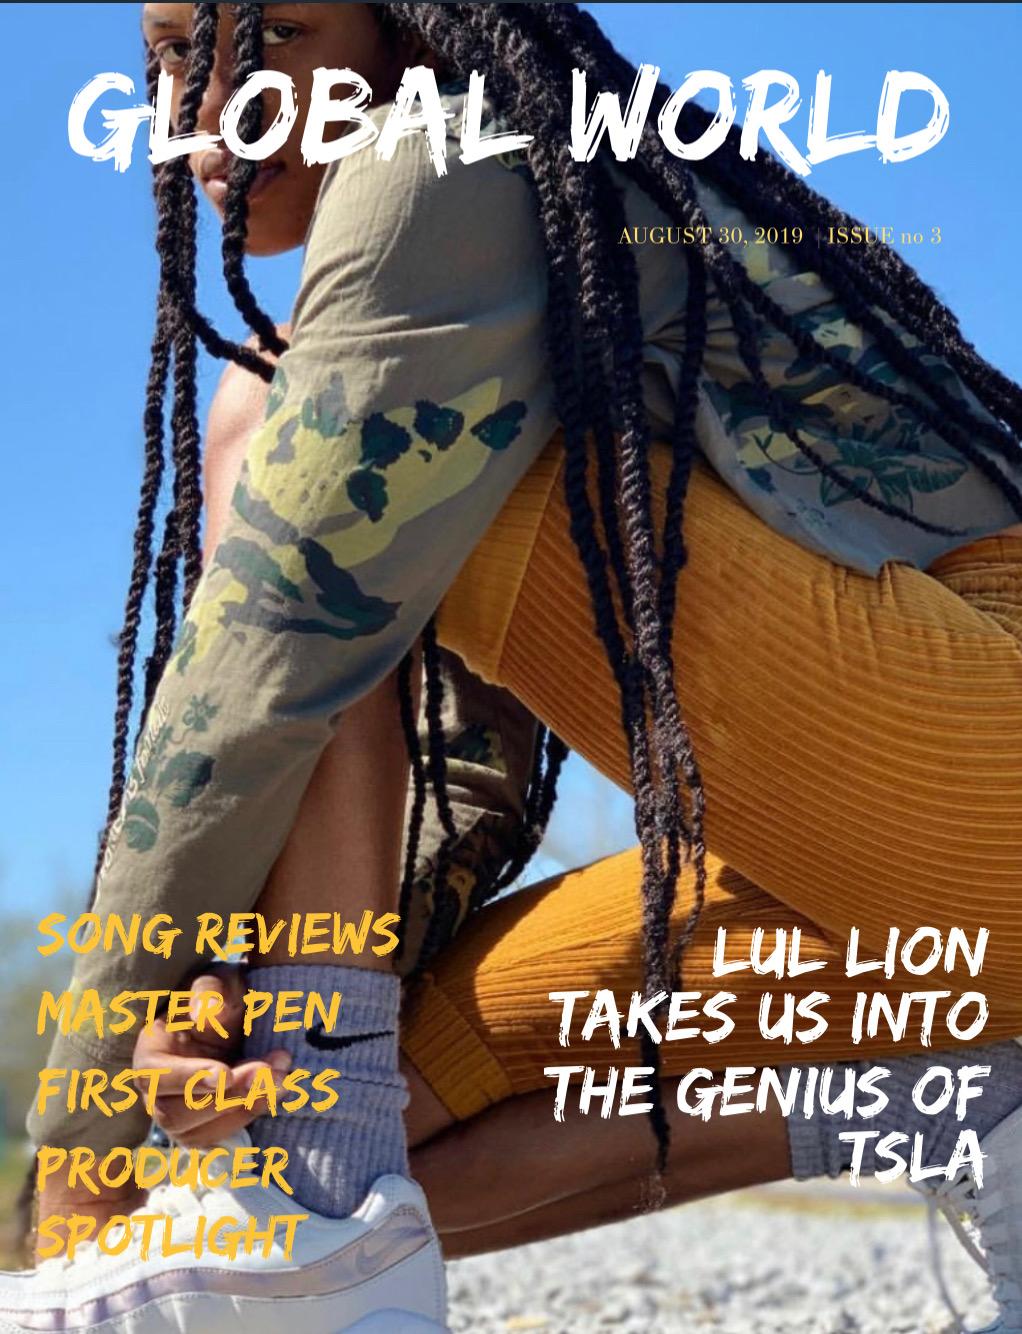 Global World Magazine Issue 3 – Featuring Lul Lion, Jaeo Draftpick, MFNCheeks, SENUA, Tekitha, Seventeen Avenue, Rebel Kuzco, Benny the Butcher, NO1MC, Kope, Devtrax, BIG OC, and Fred Thompson